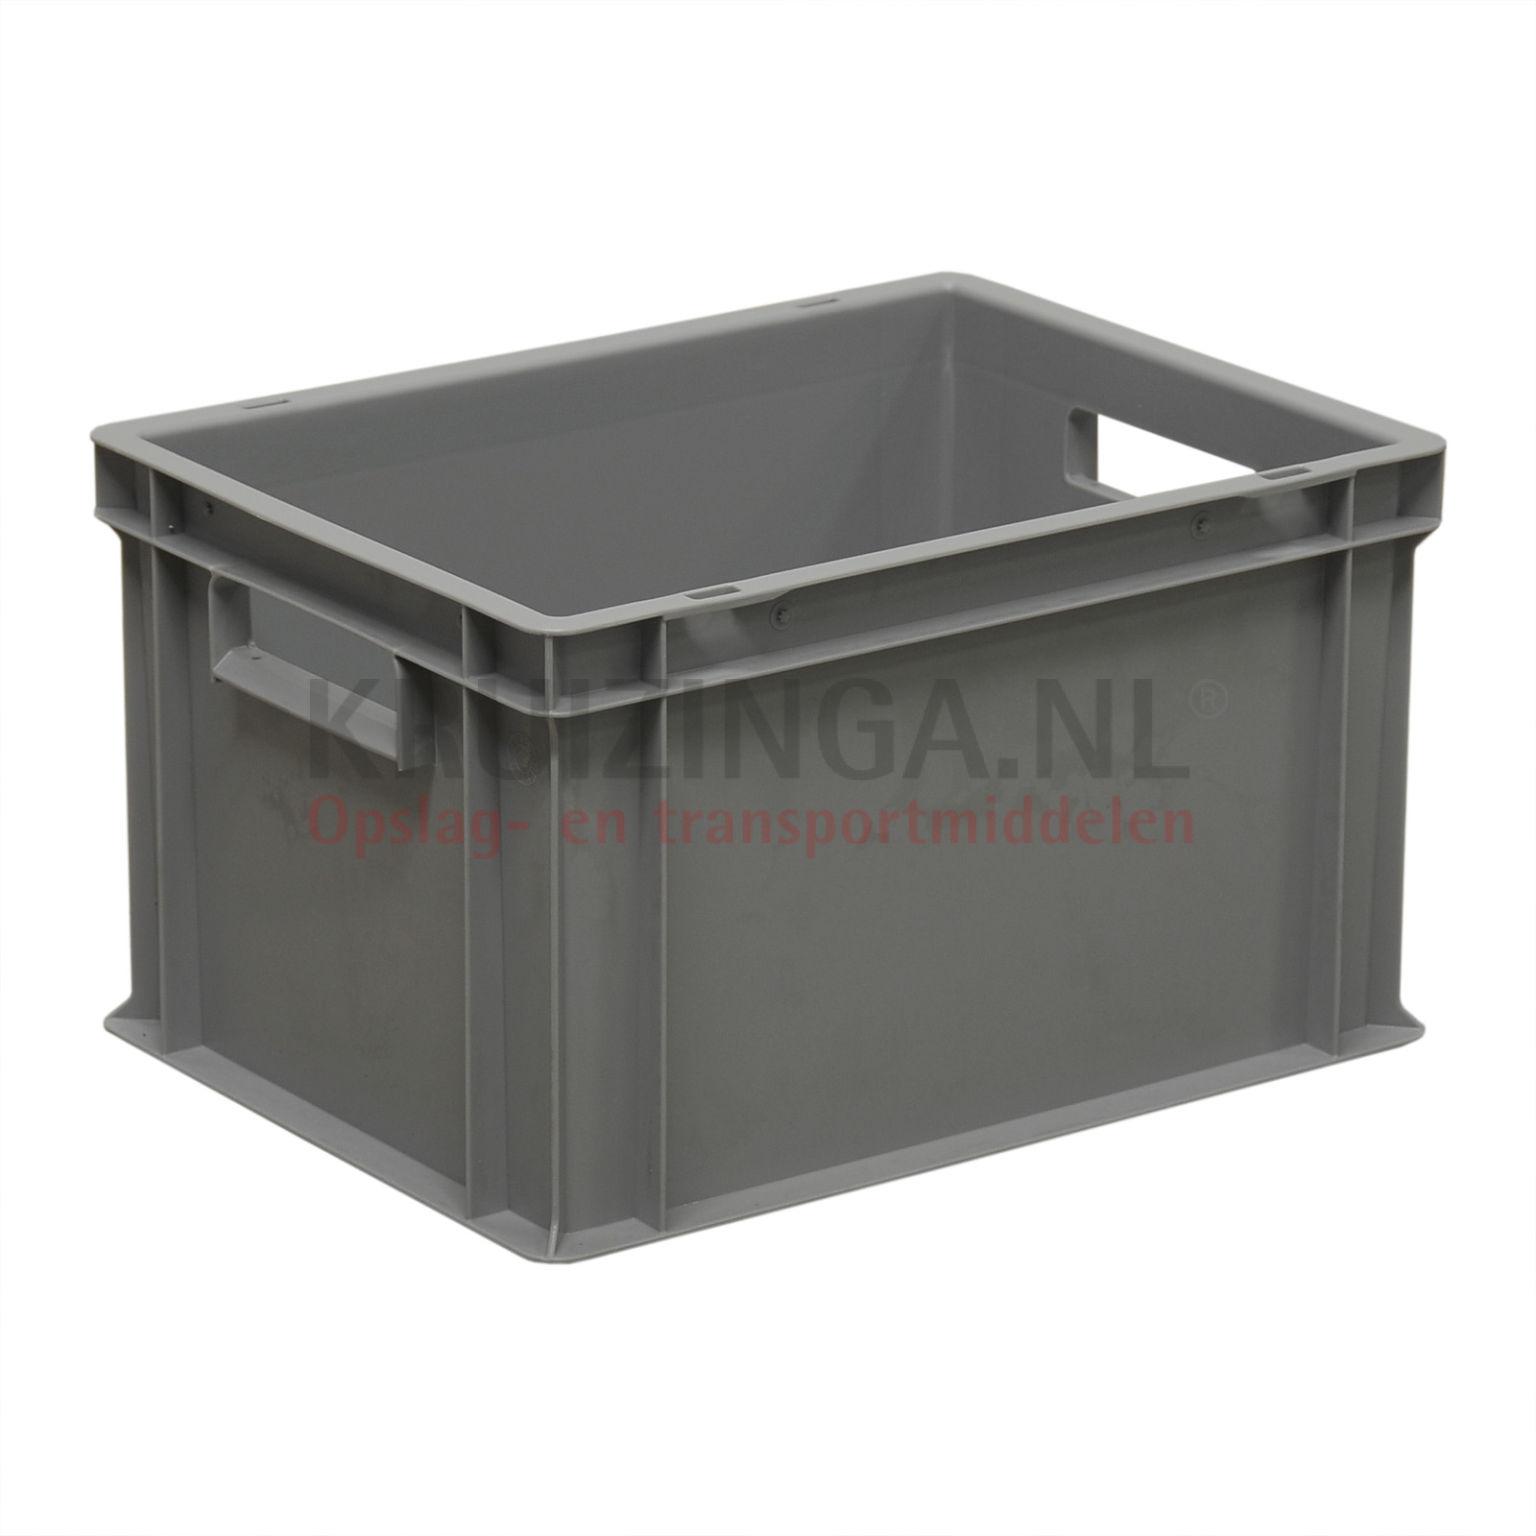 stapelboxen kunststoff stapelbar restbestand angebote gebraucht. Black Bedroom Furniture Sets. Home Design Ideas